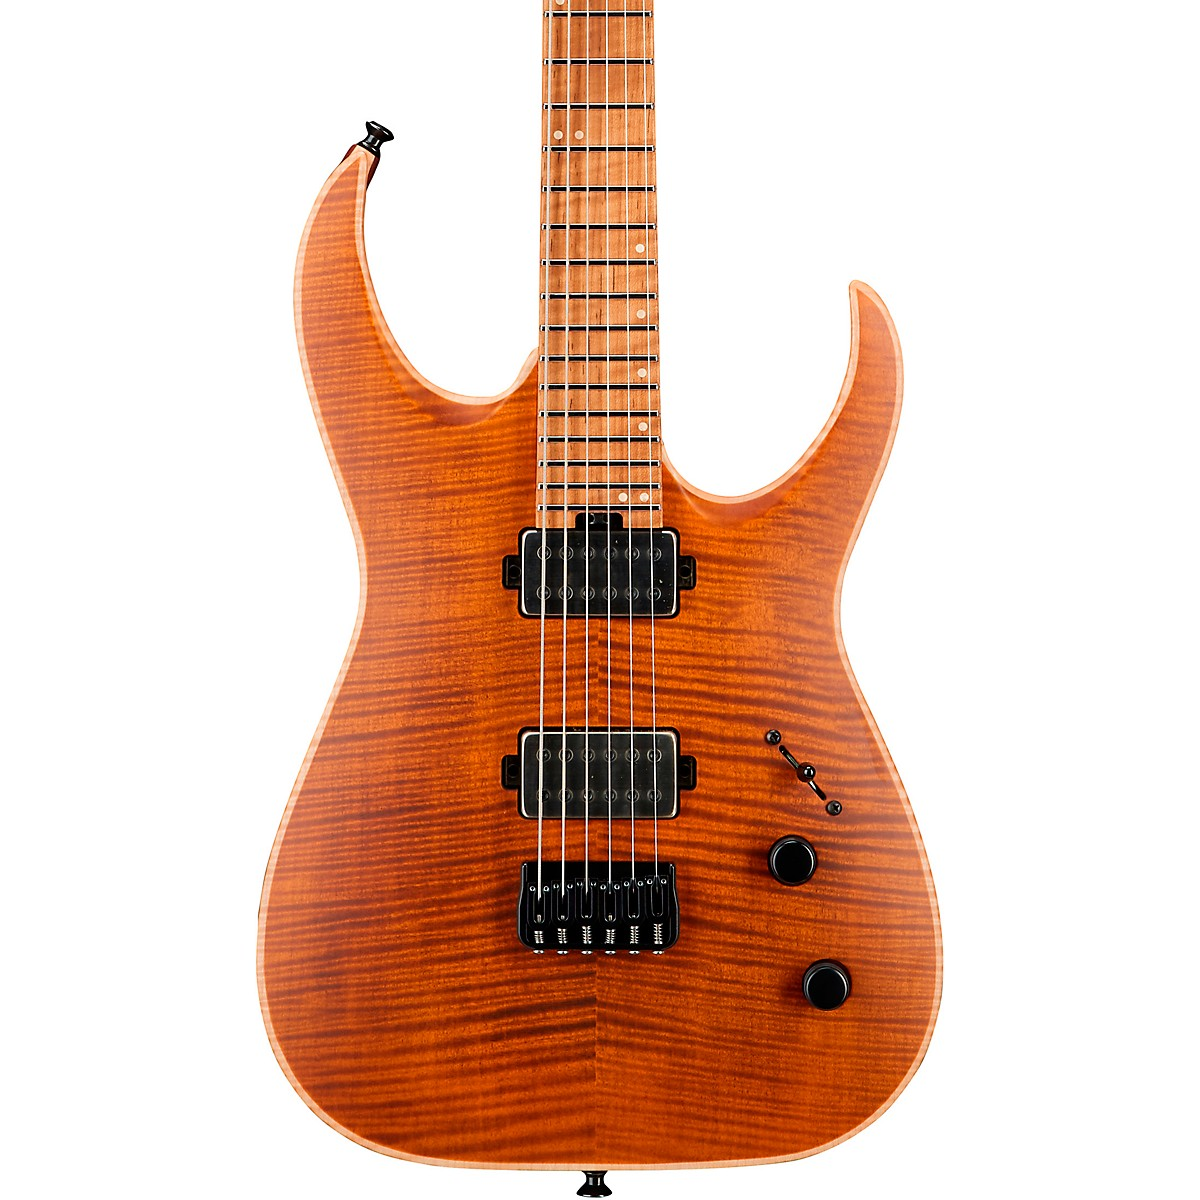 Jackson USA Signature Misha Mansoor Juggernaut HT6FM Electric Guitar